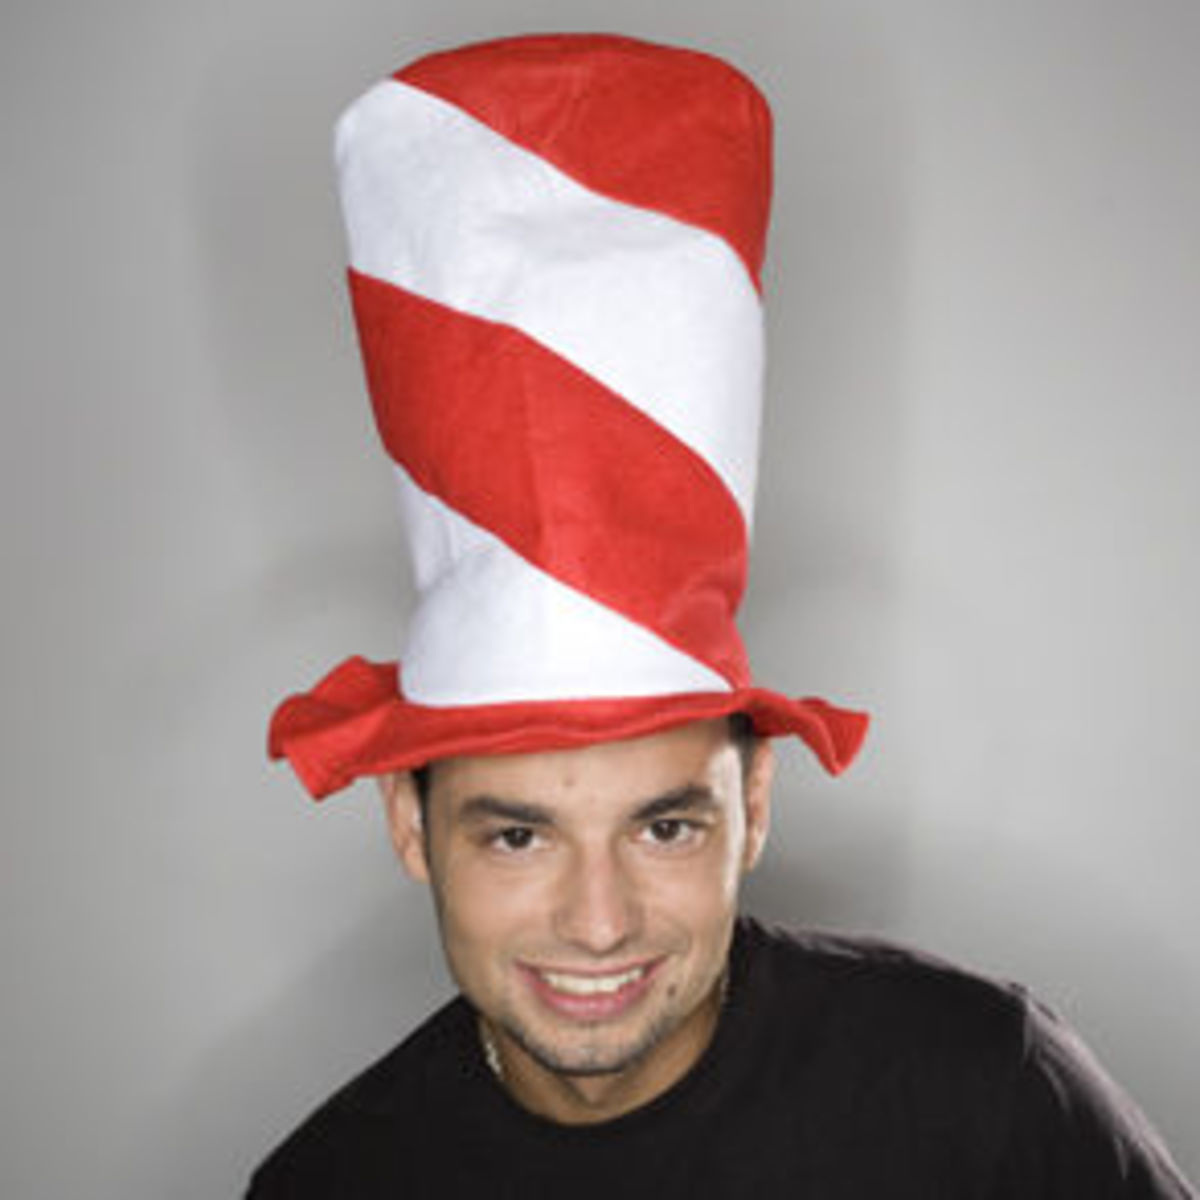 Stovetop Christmas Hat